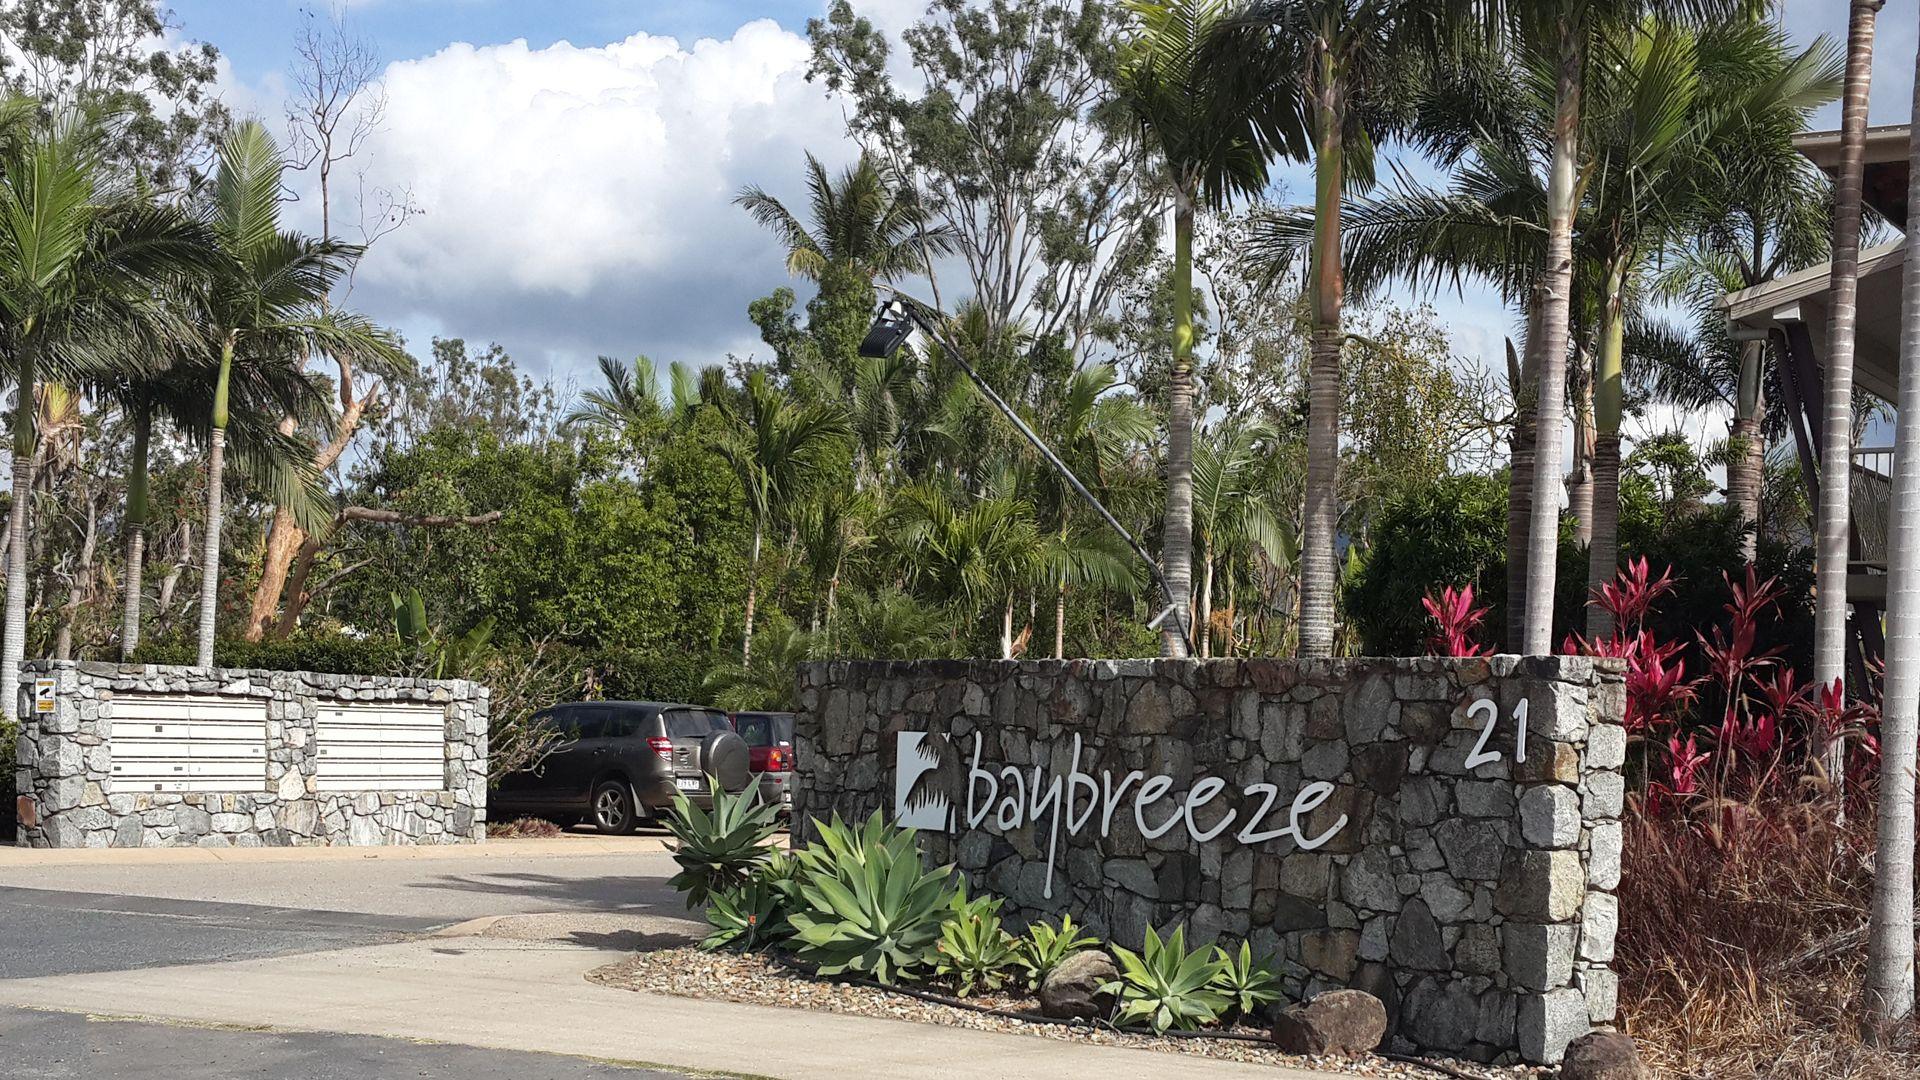 52/21 Shute Harbour Road, Cannonvale QLD 4802, Image 18